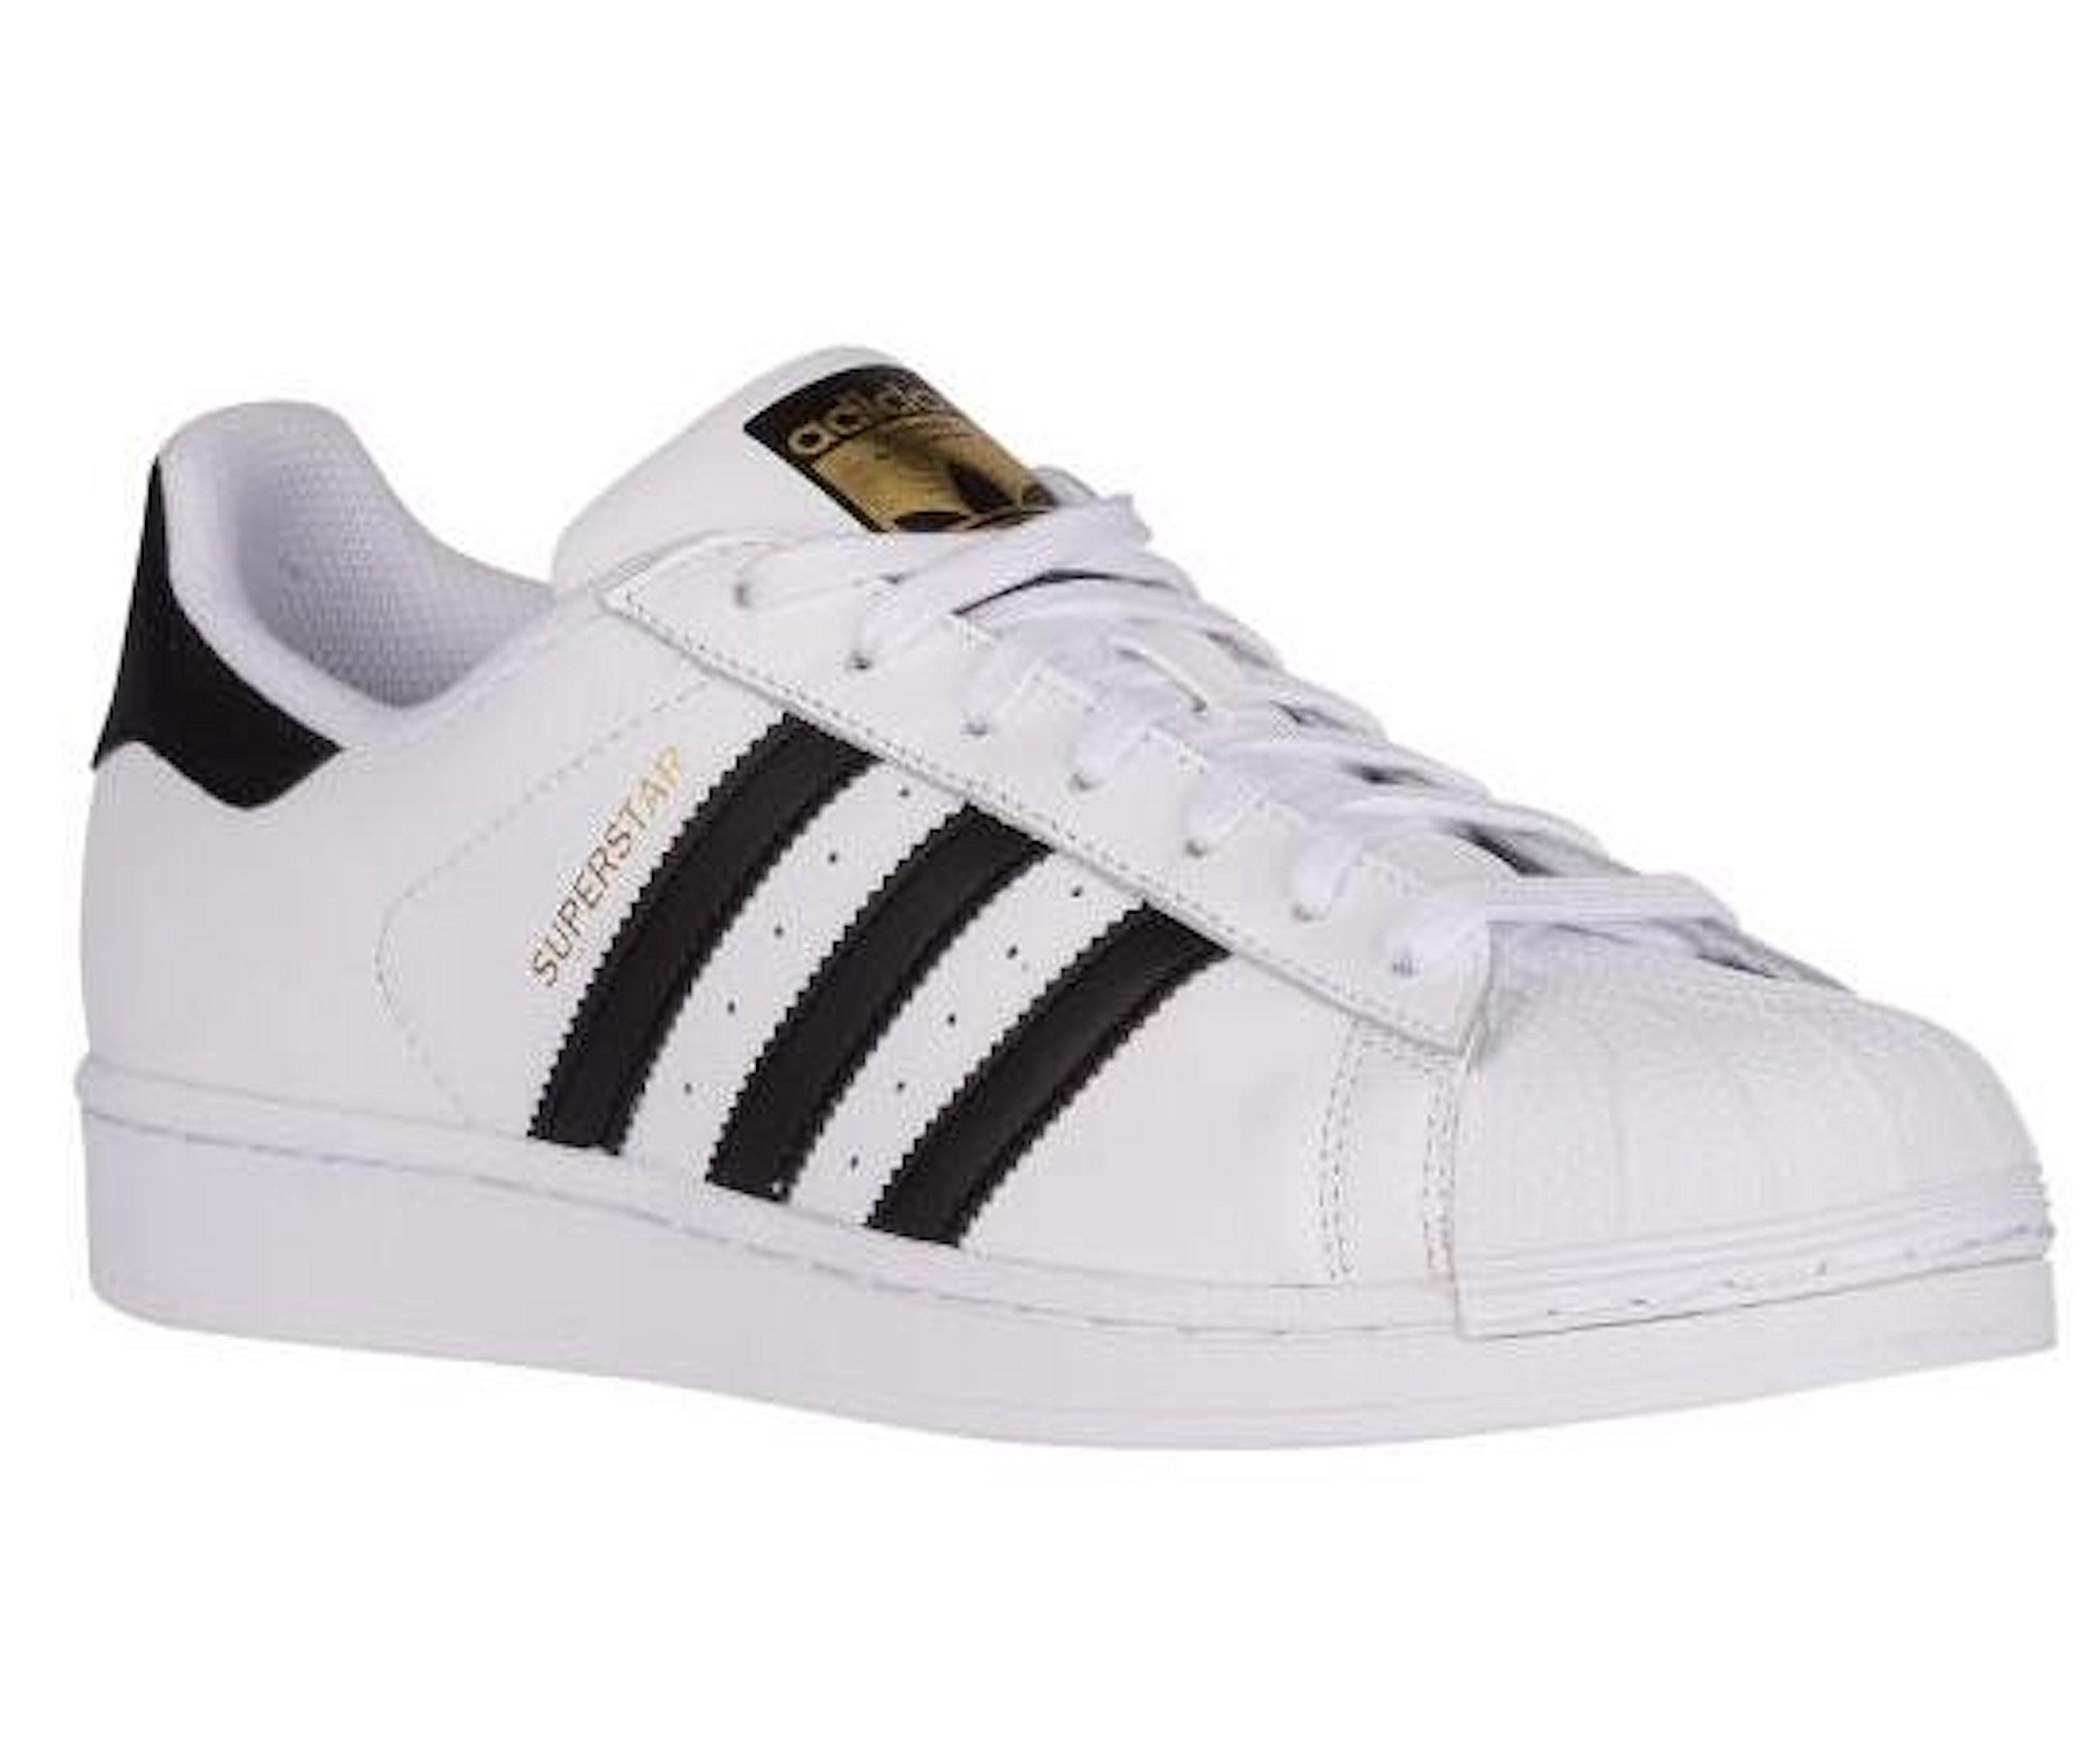 nero Superstar Bianco S8185838Bianco Adidas Classic wNOmnyv80